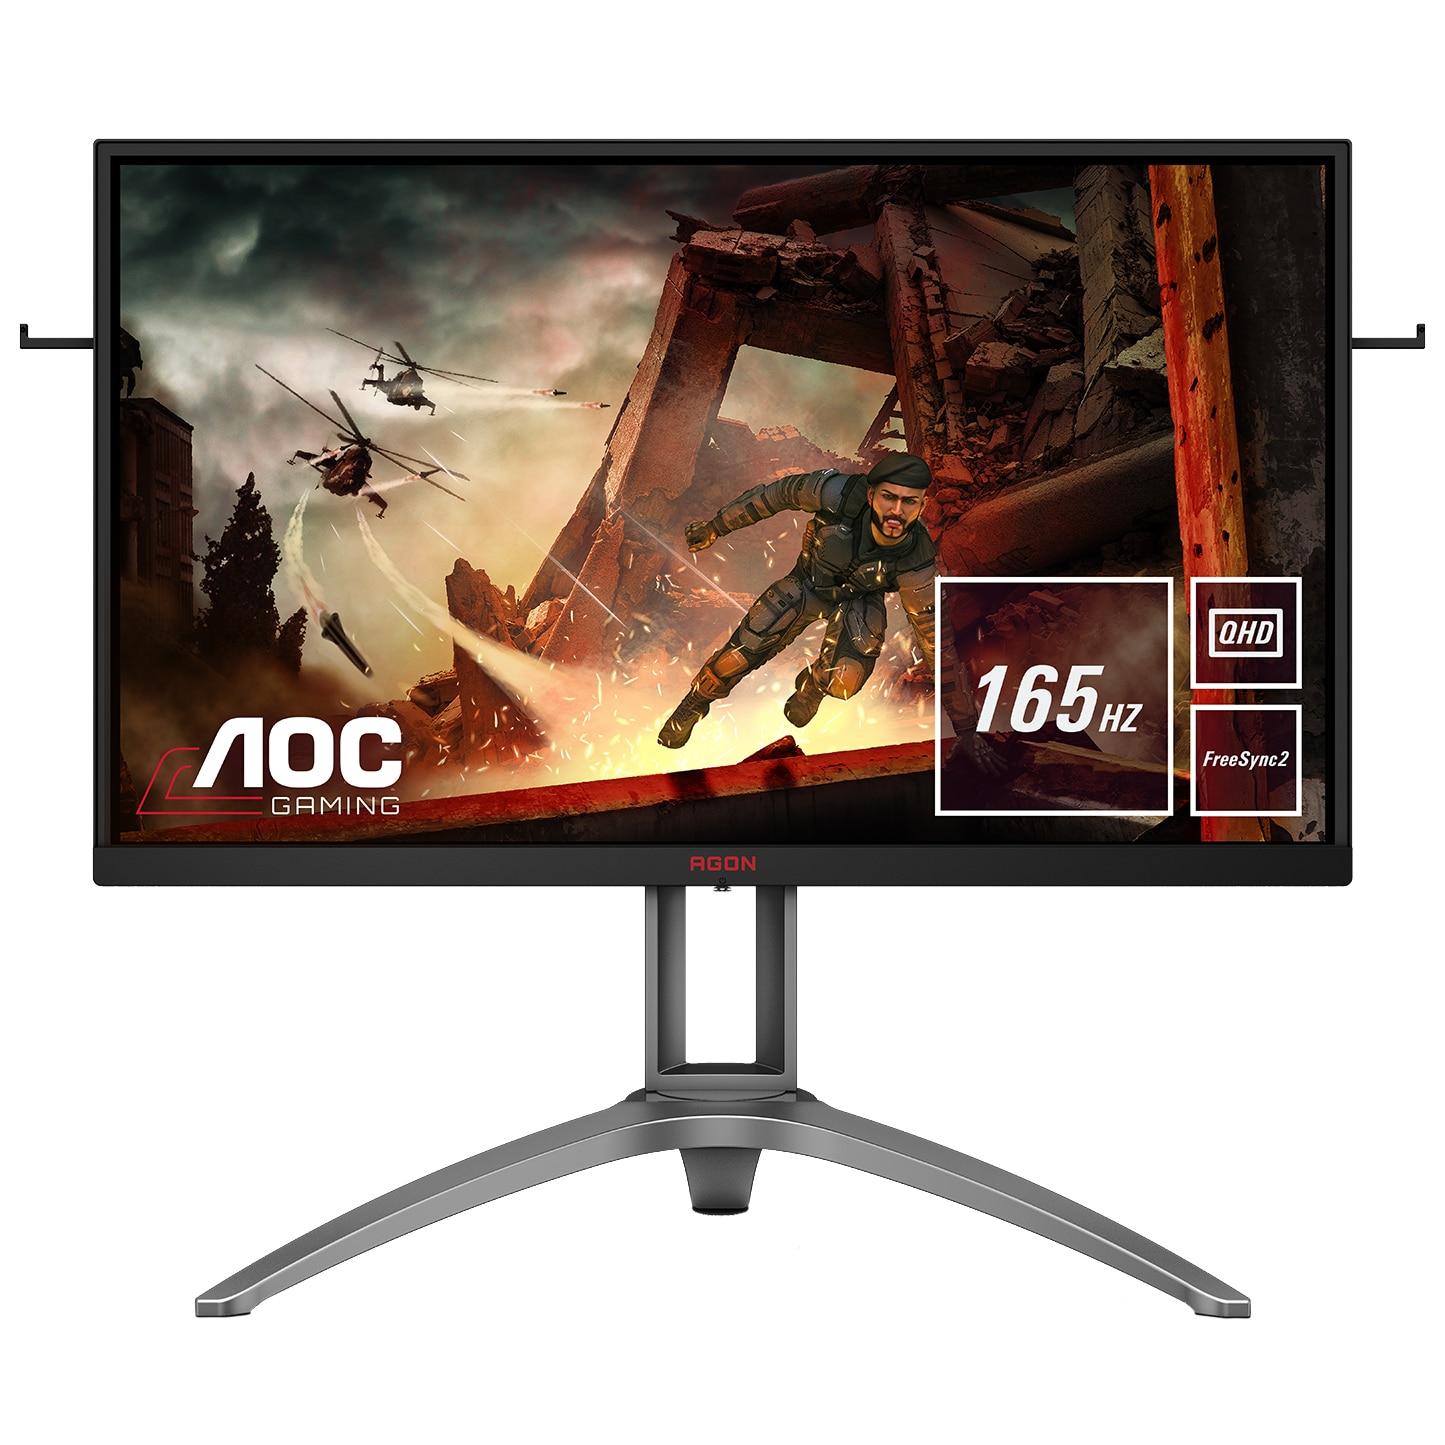 "Fotografie Monitor Gaming LED VA AOC AGON 3 27"", WQHD, DisplayPort, 165Hz, 1ms, FreeSync 2, HDR, Negru/Rosu, Pivot, AG273QX"